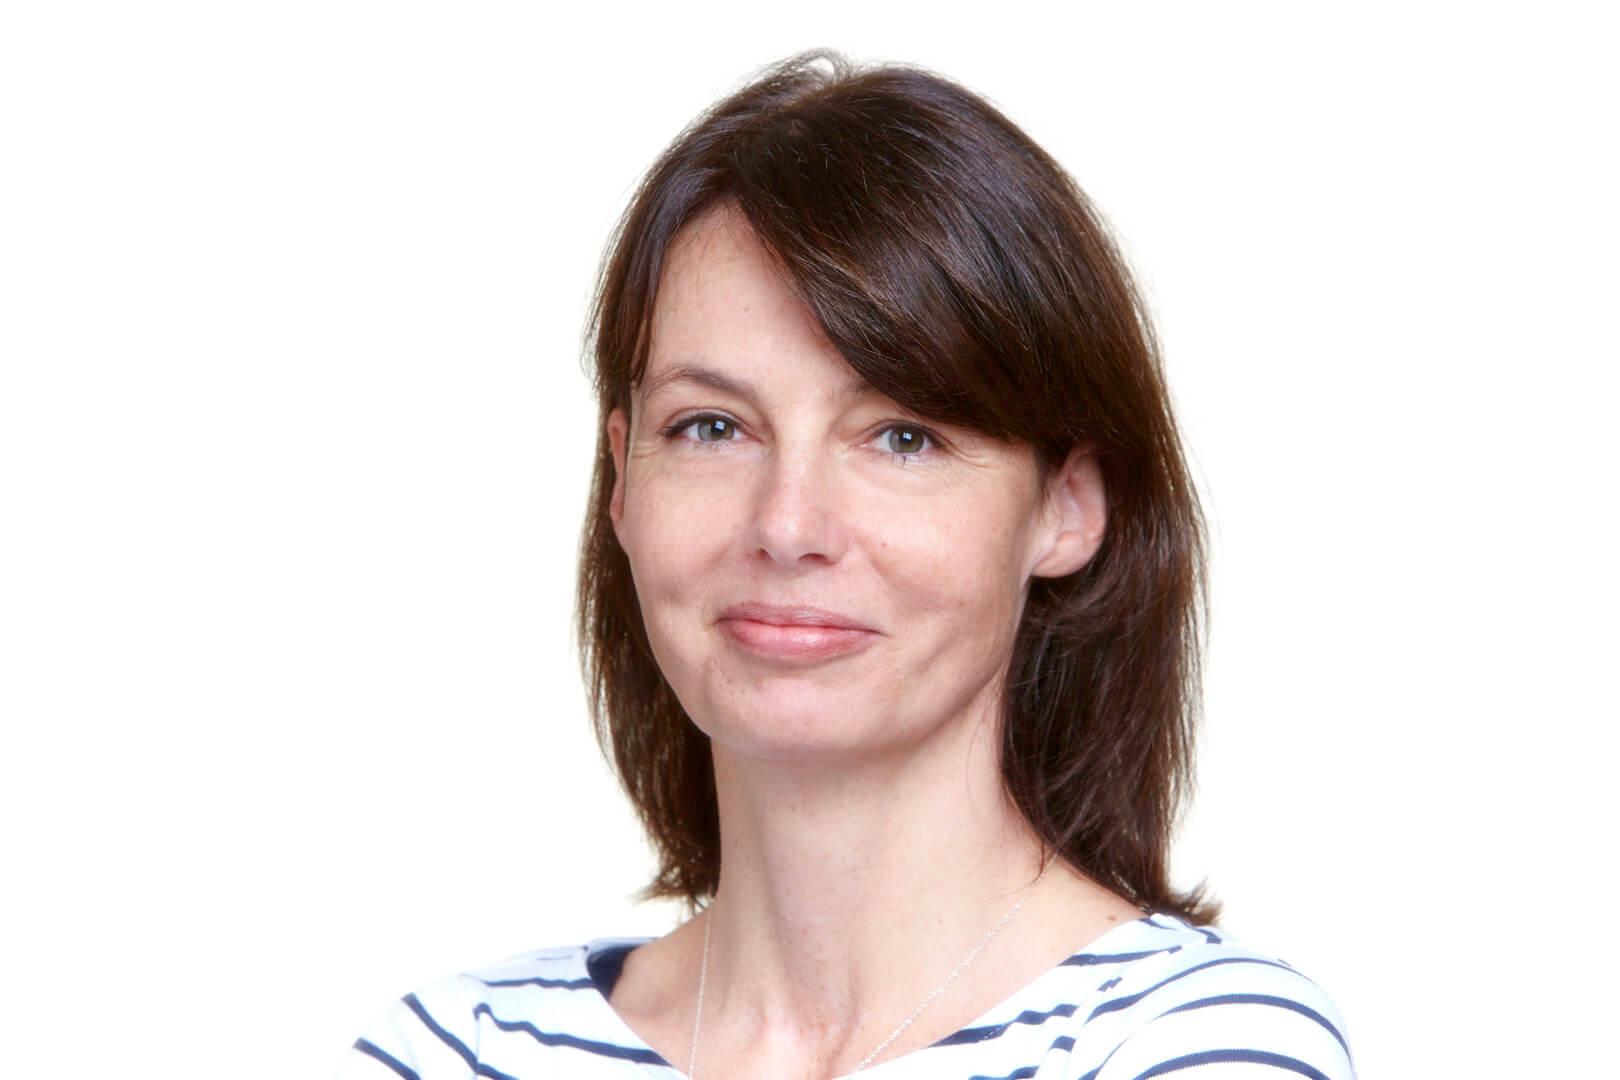 Anja Lohfink